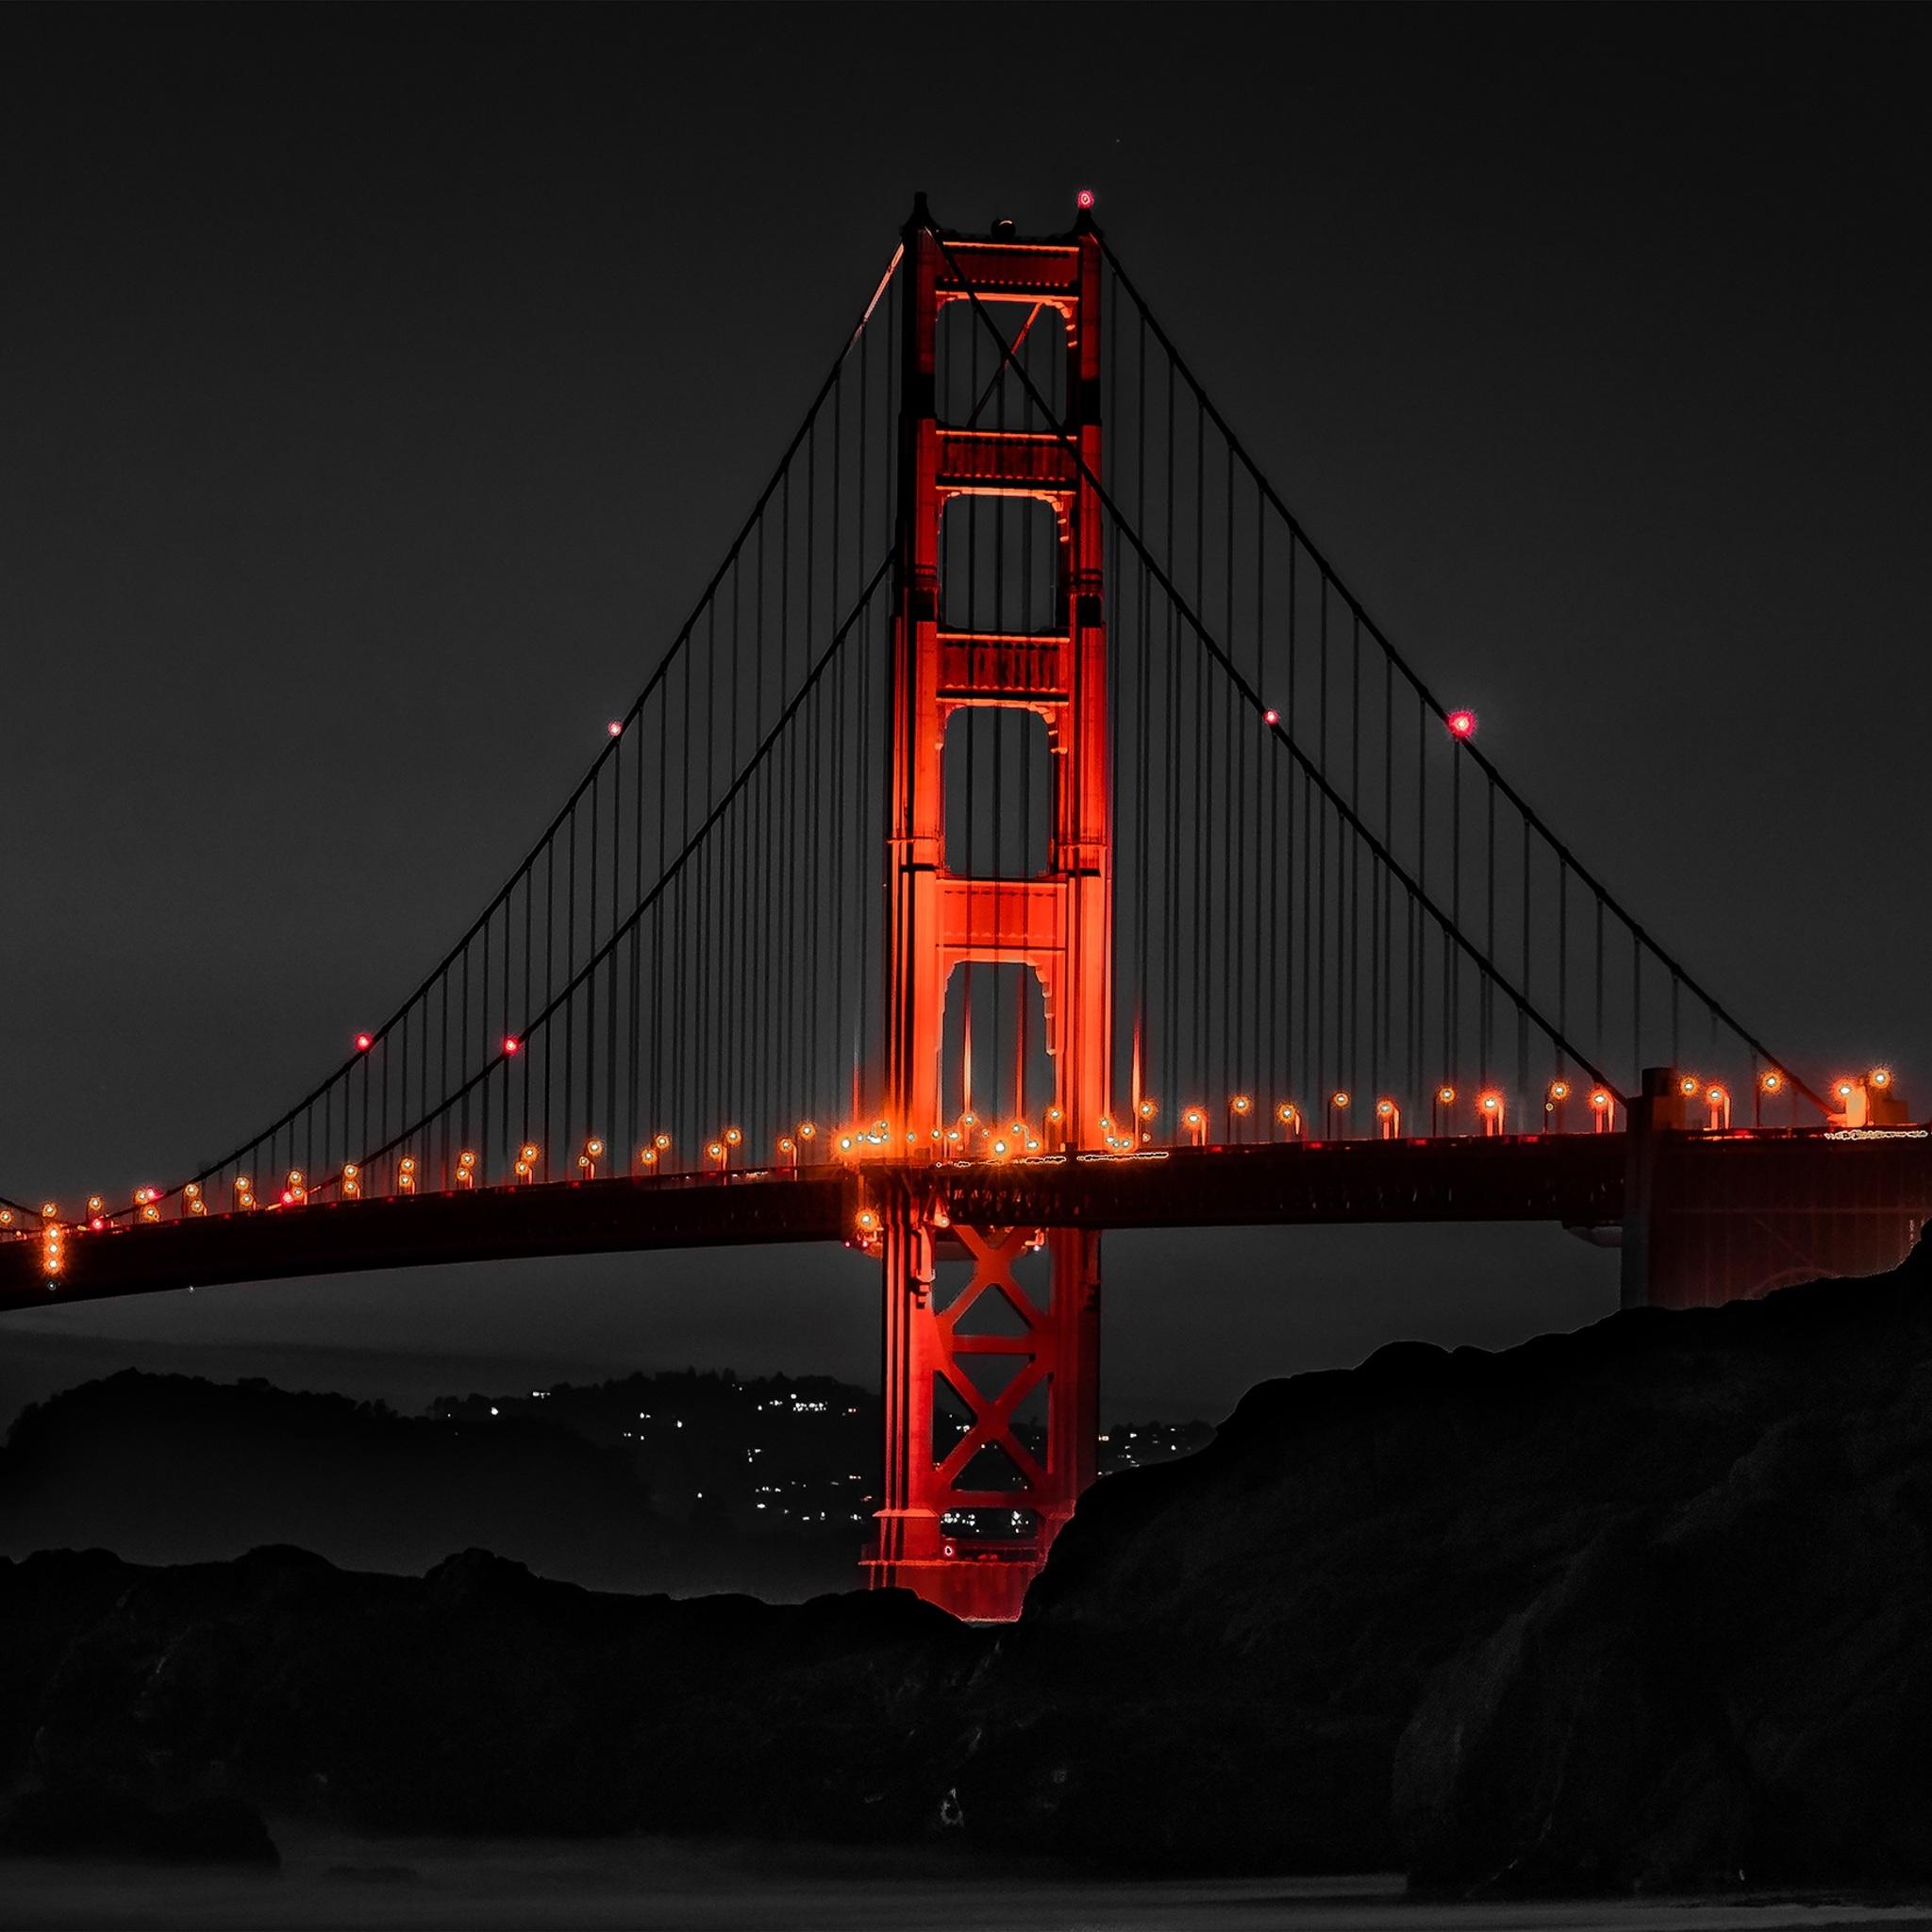 2048x2048 Golden Gate Bridge San Francisco Night Ipad Air